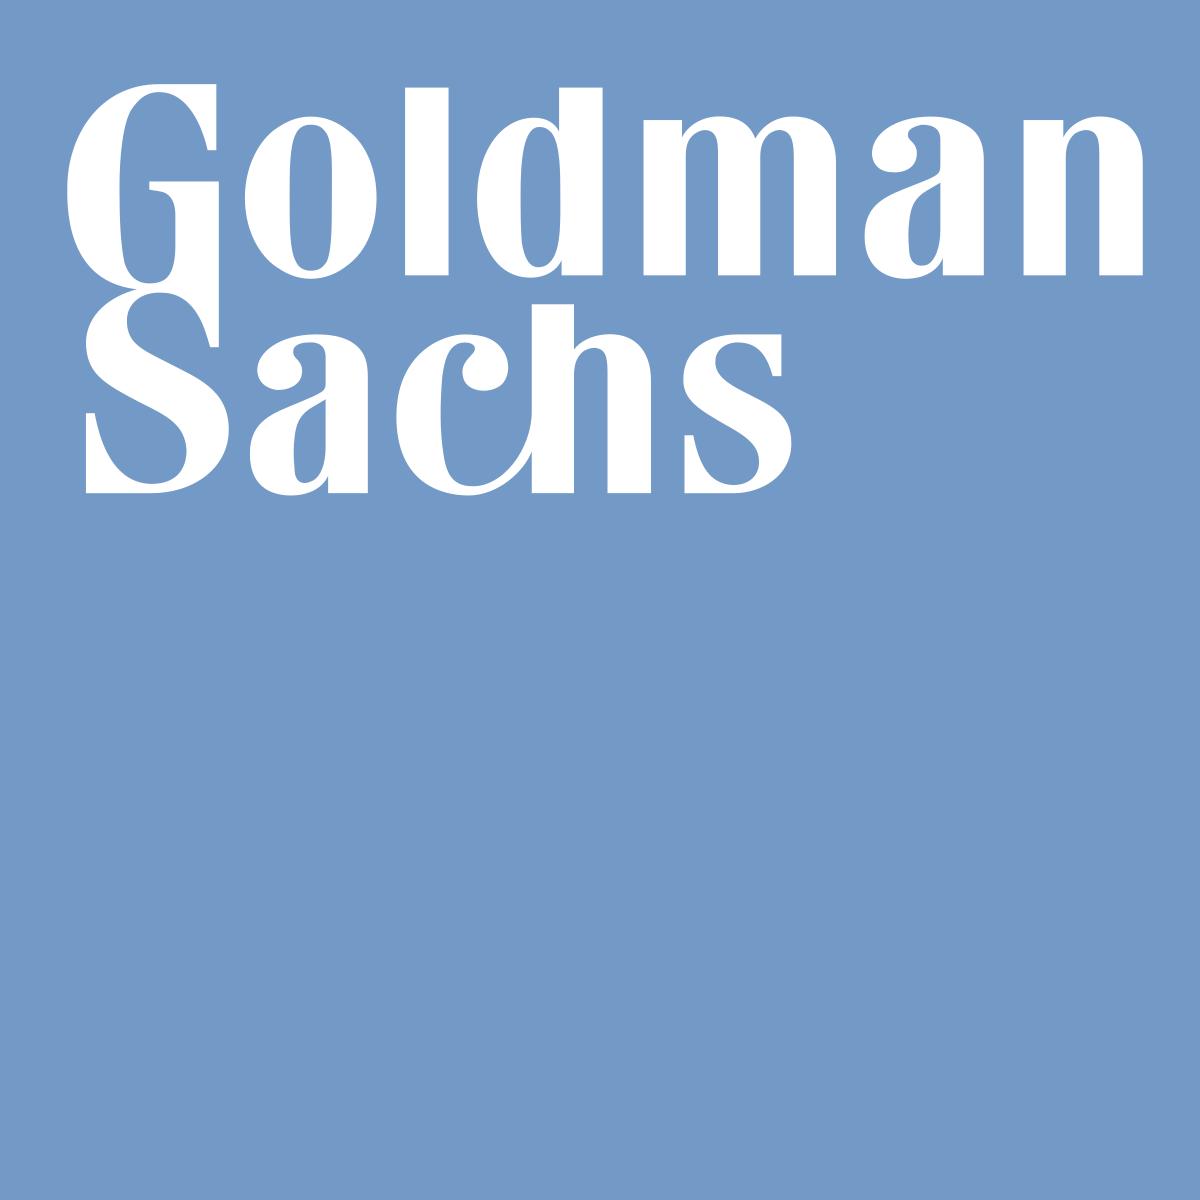 The Goldman Sachs Group's logo